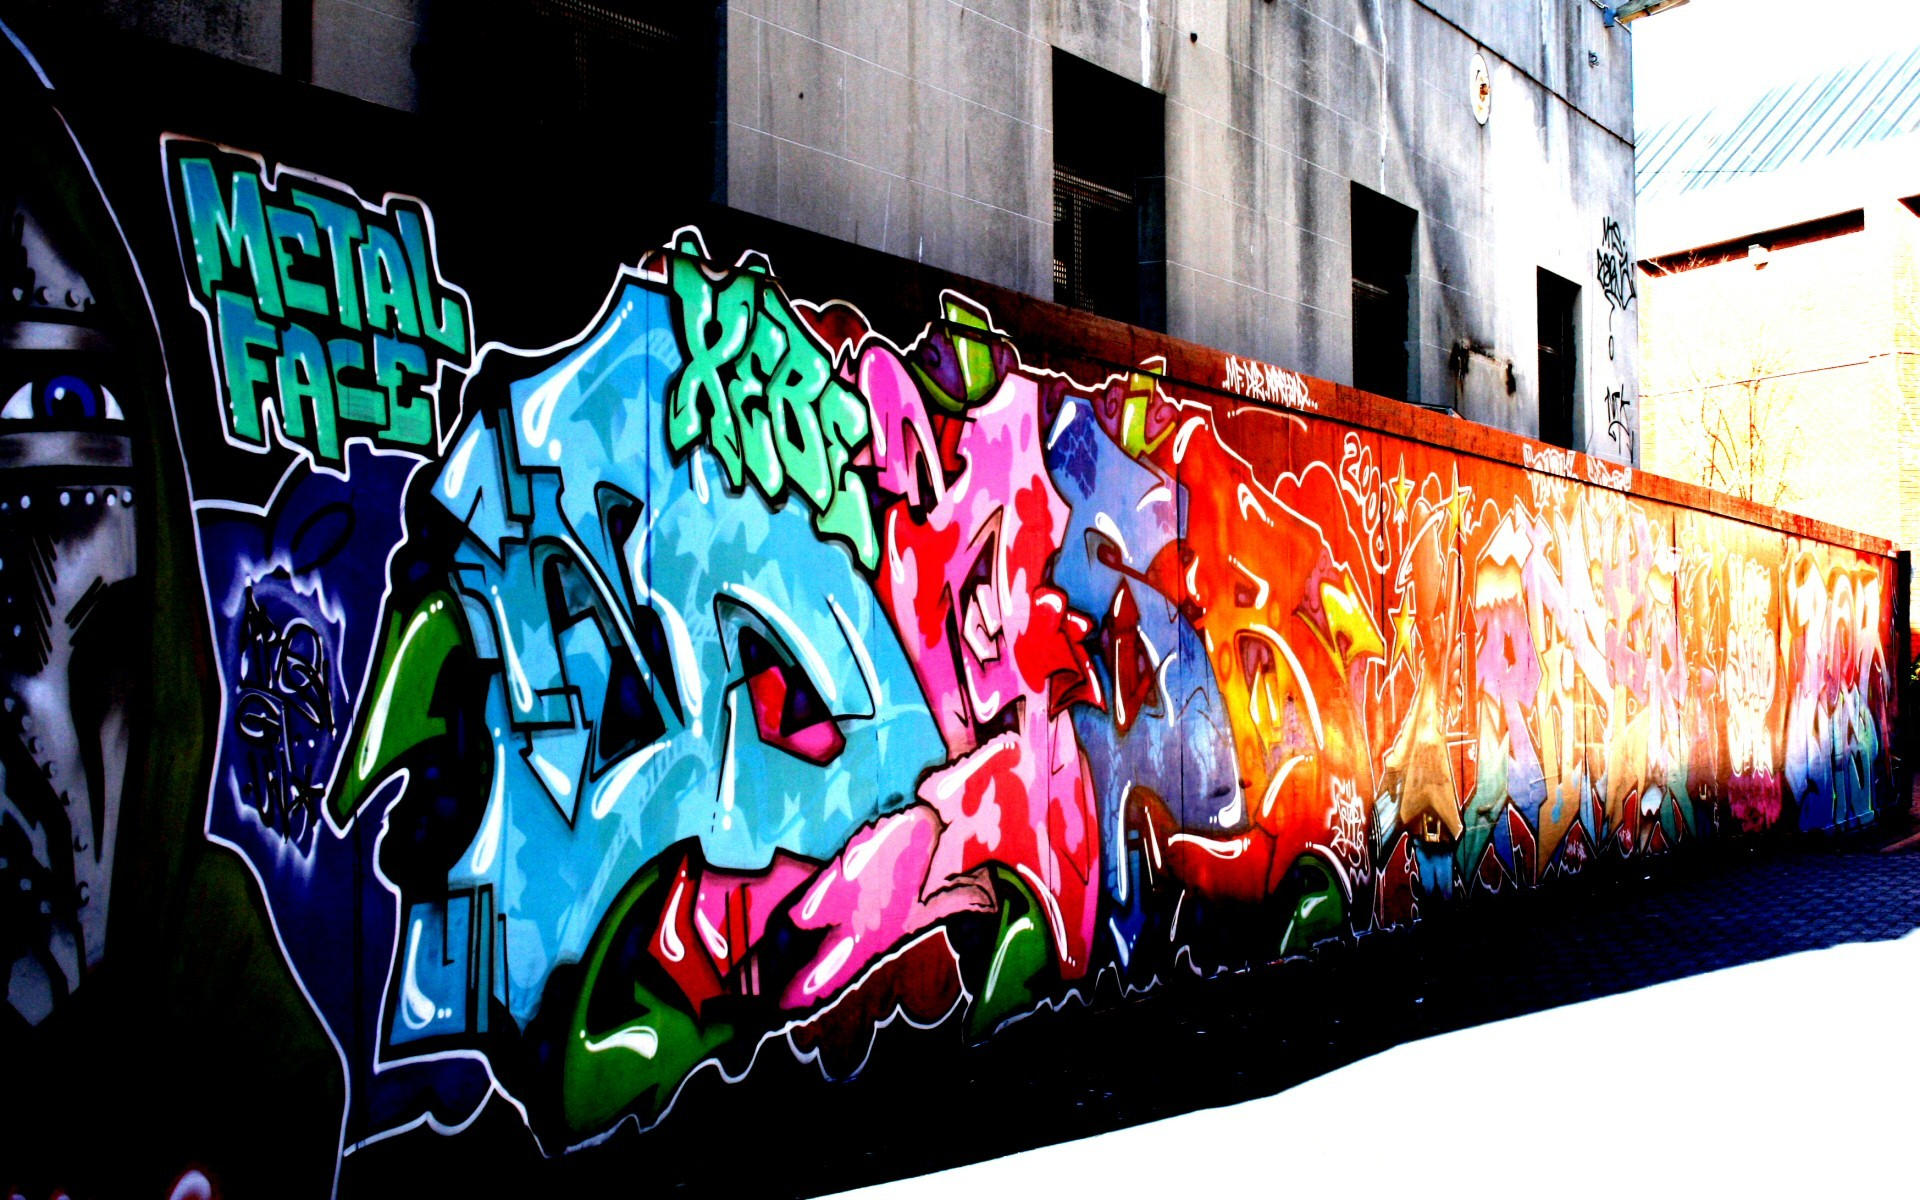 Graffiti wall wallpaper - Wall Graffiti Wallpapers